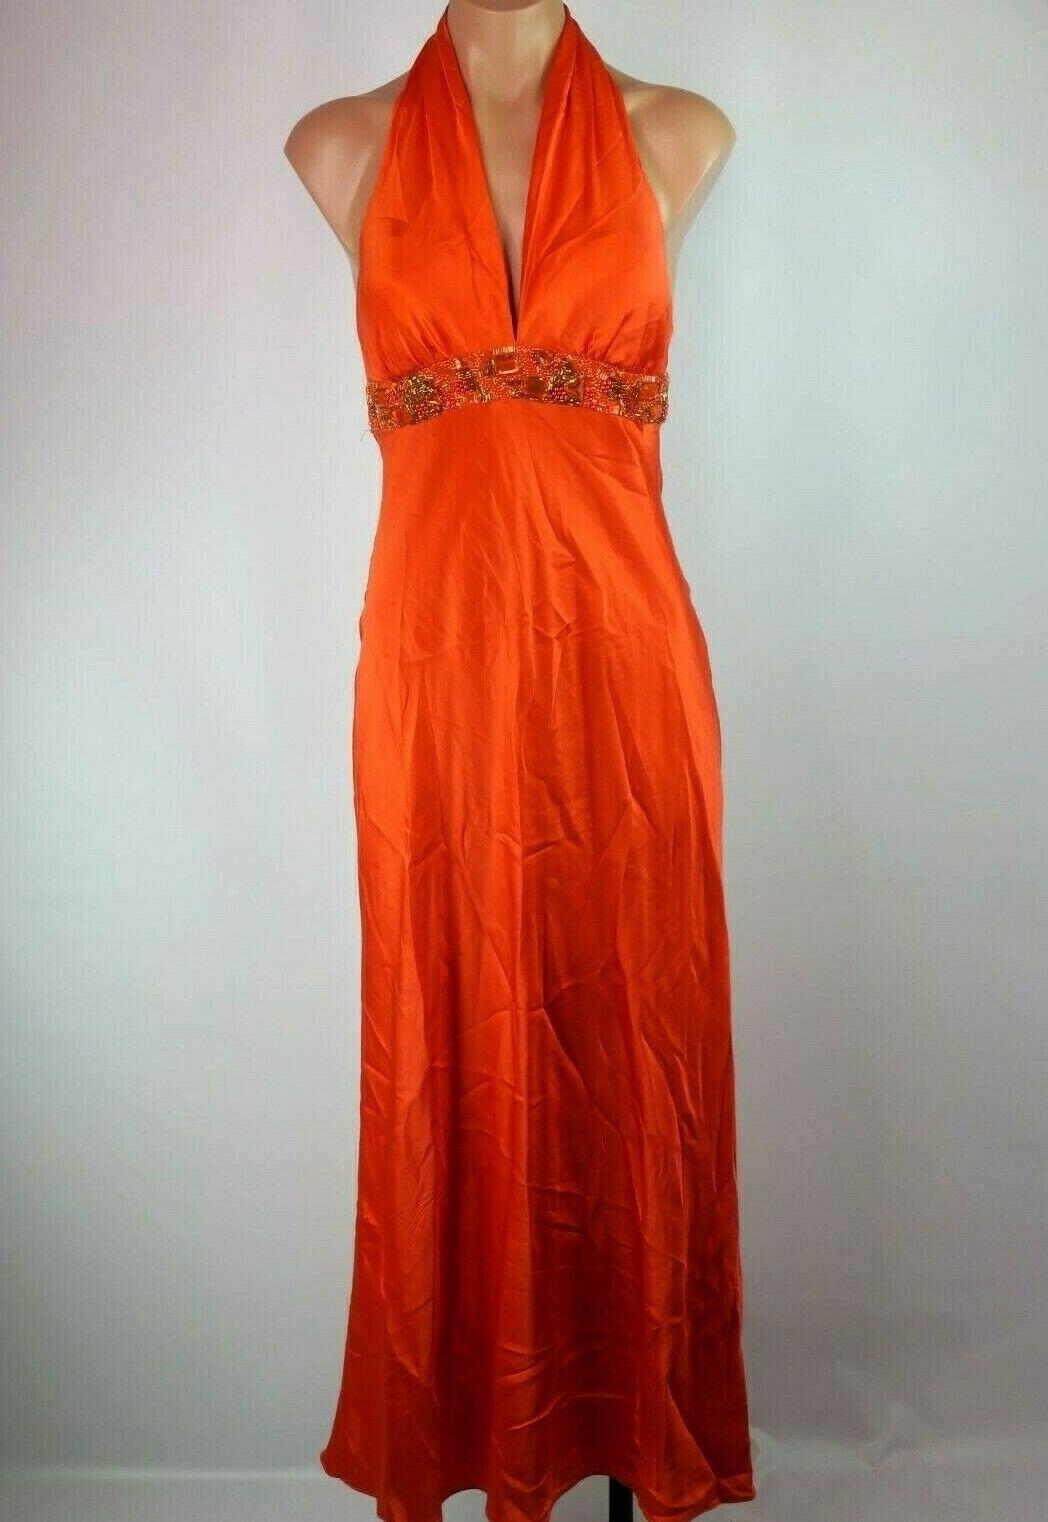 90s CACHE 100% Silk Orange Beaded Sequin Halter Slinky Slip Gown Dress Sz 2